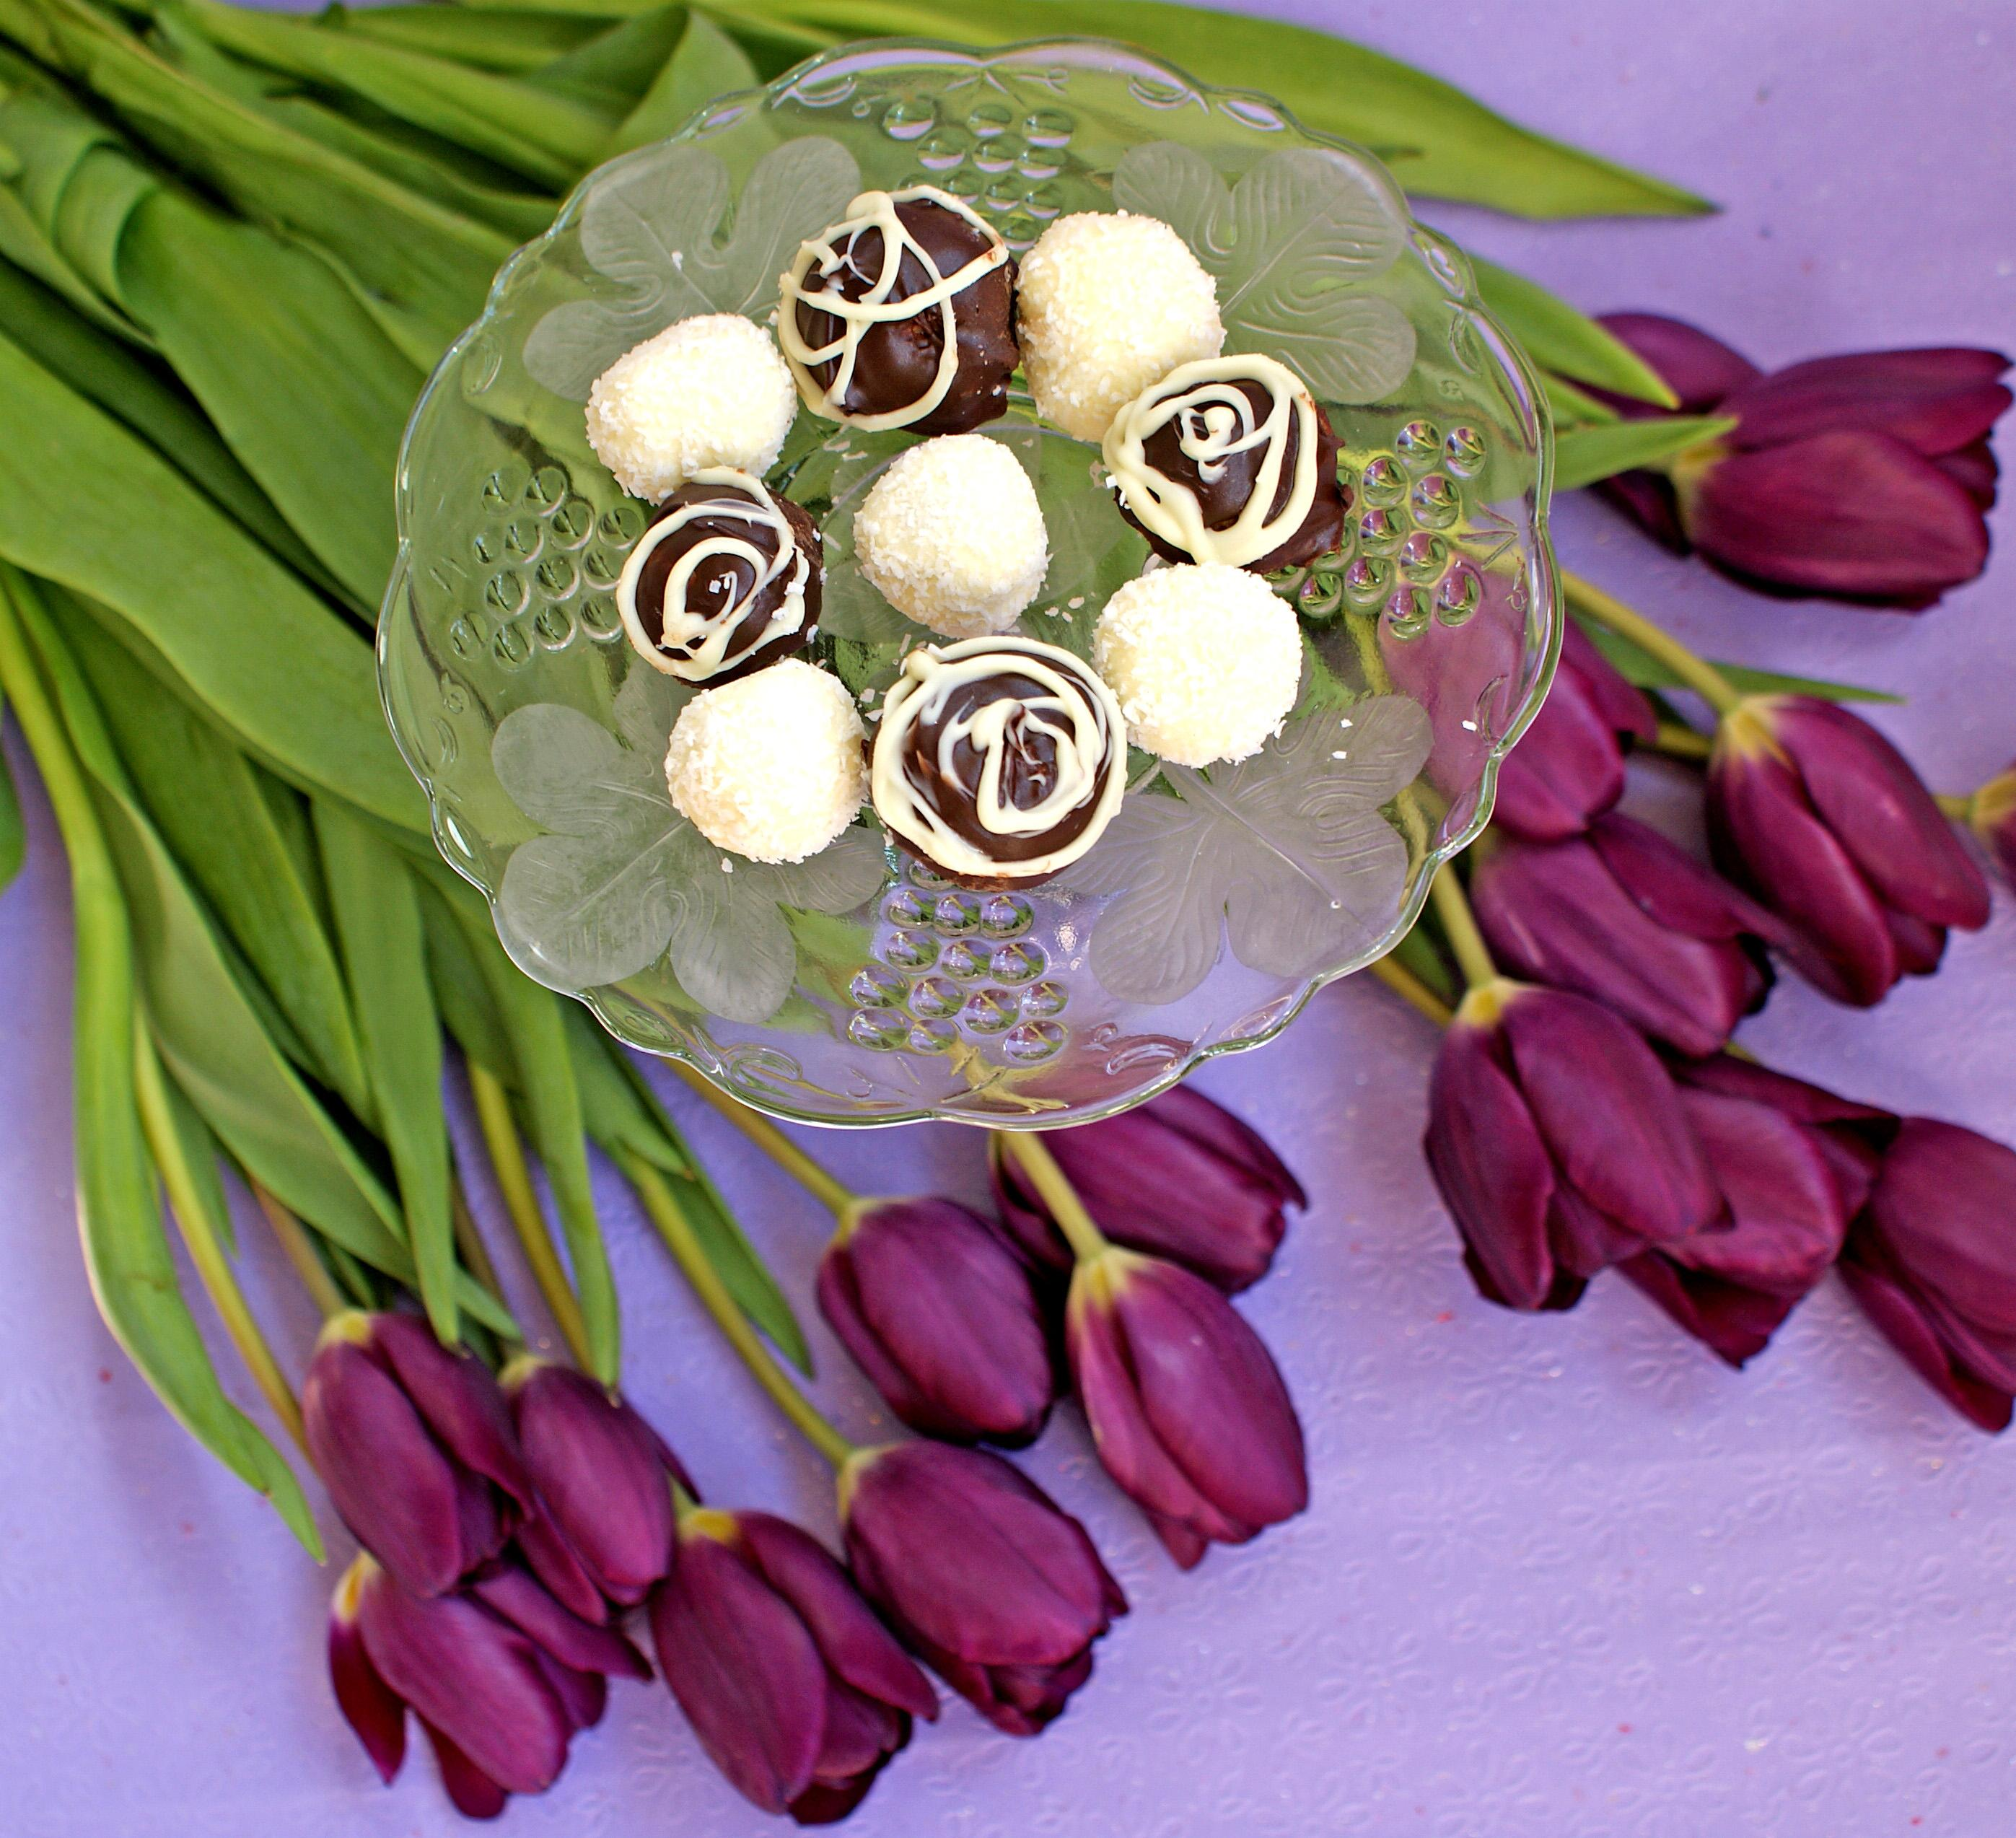 Bomboane cu cocos trase in ciocolata